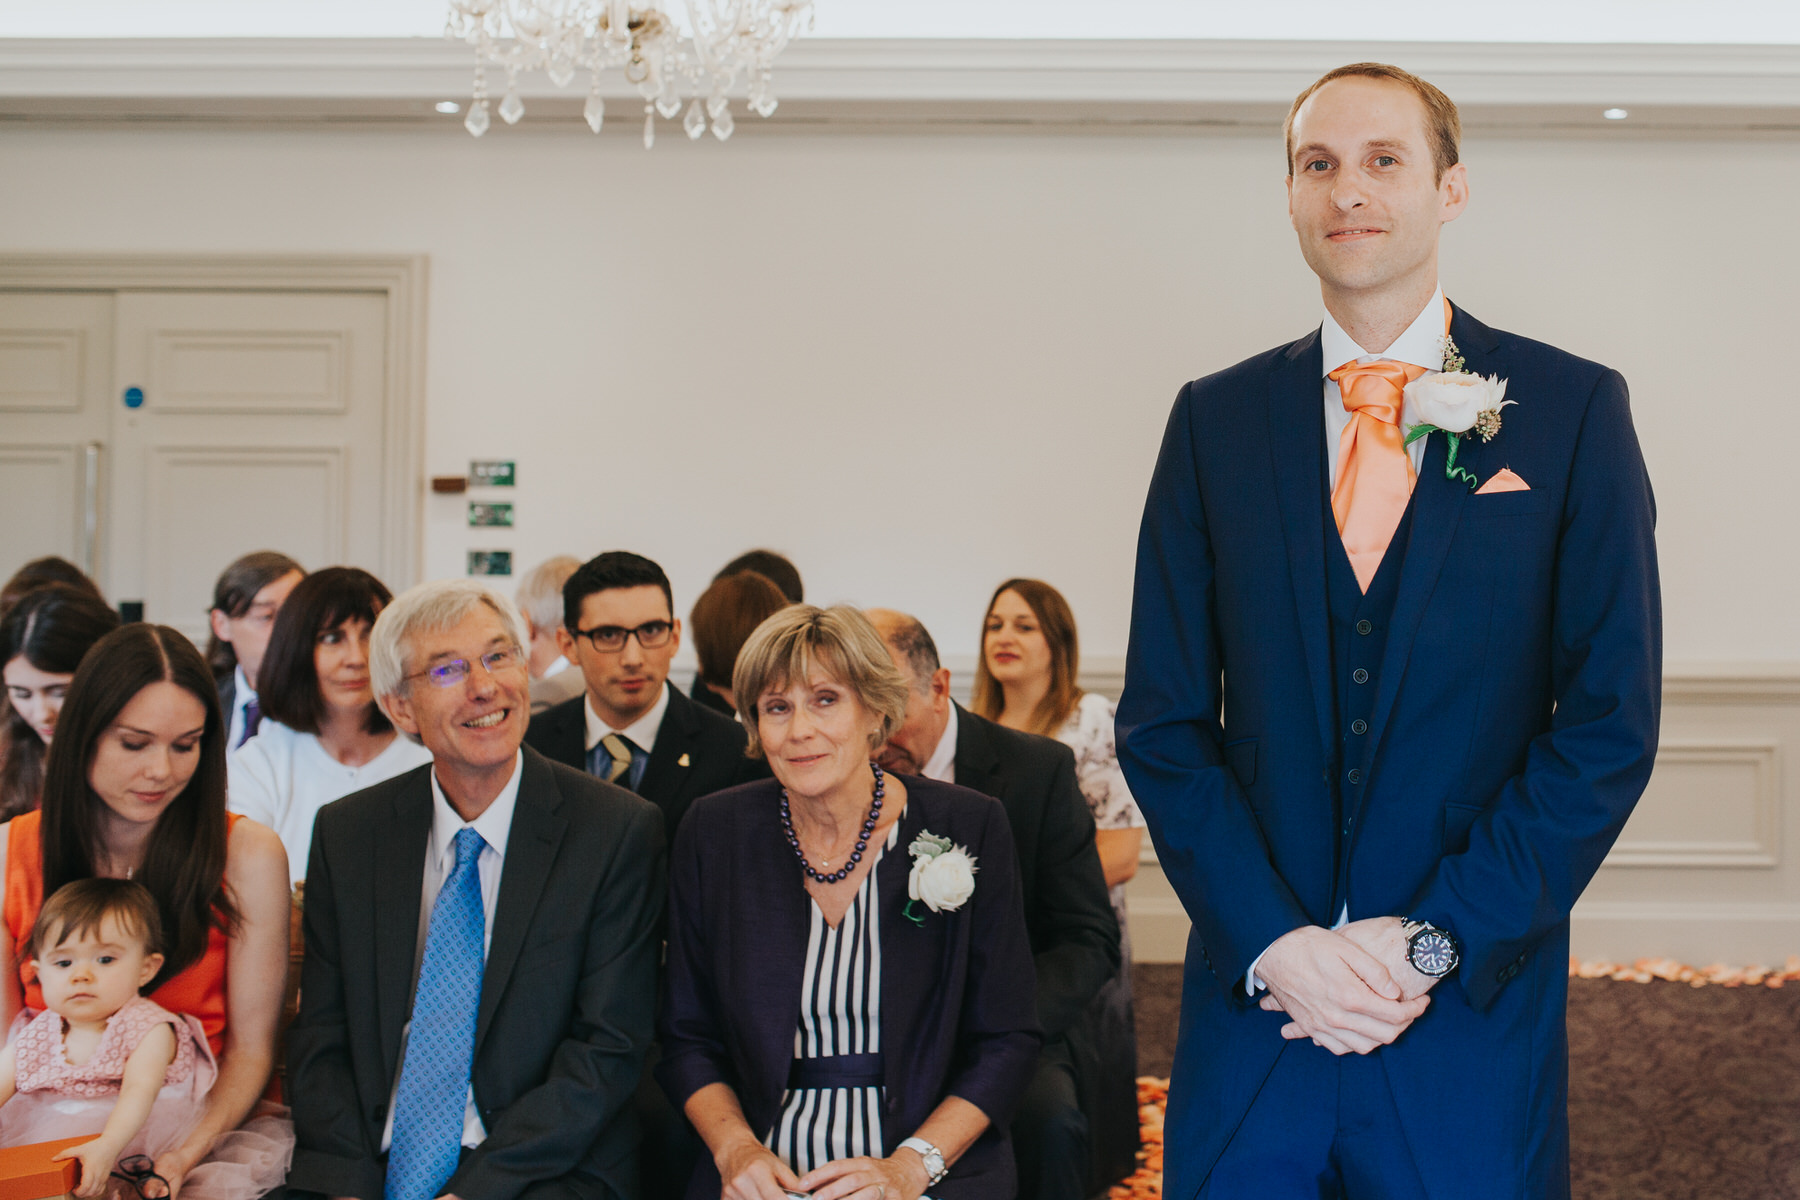 154 groom waiting for bride Woodlands Hotel marriage ceremony.jpg